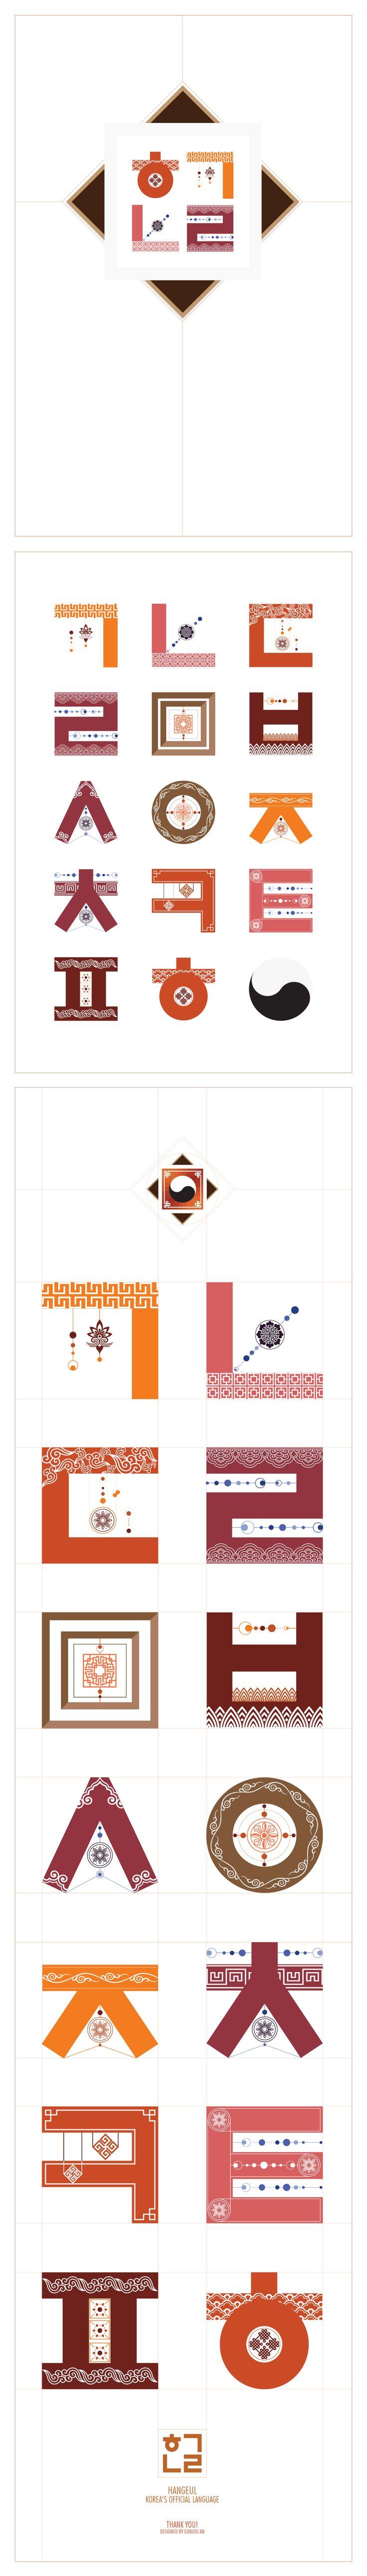 Hangeul type animation(korean alphabet)